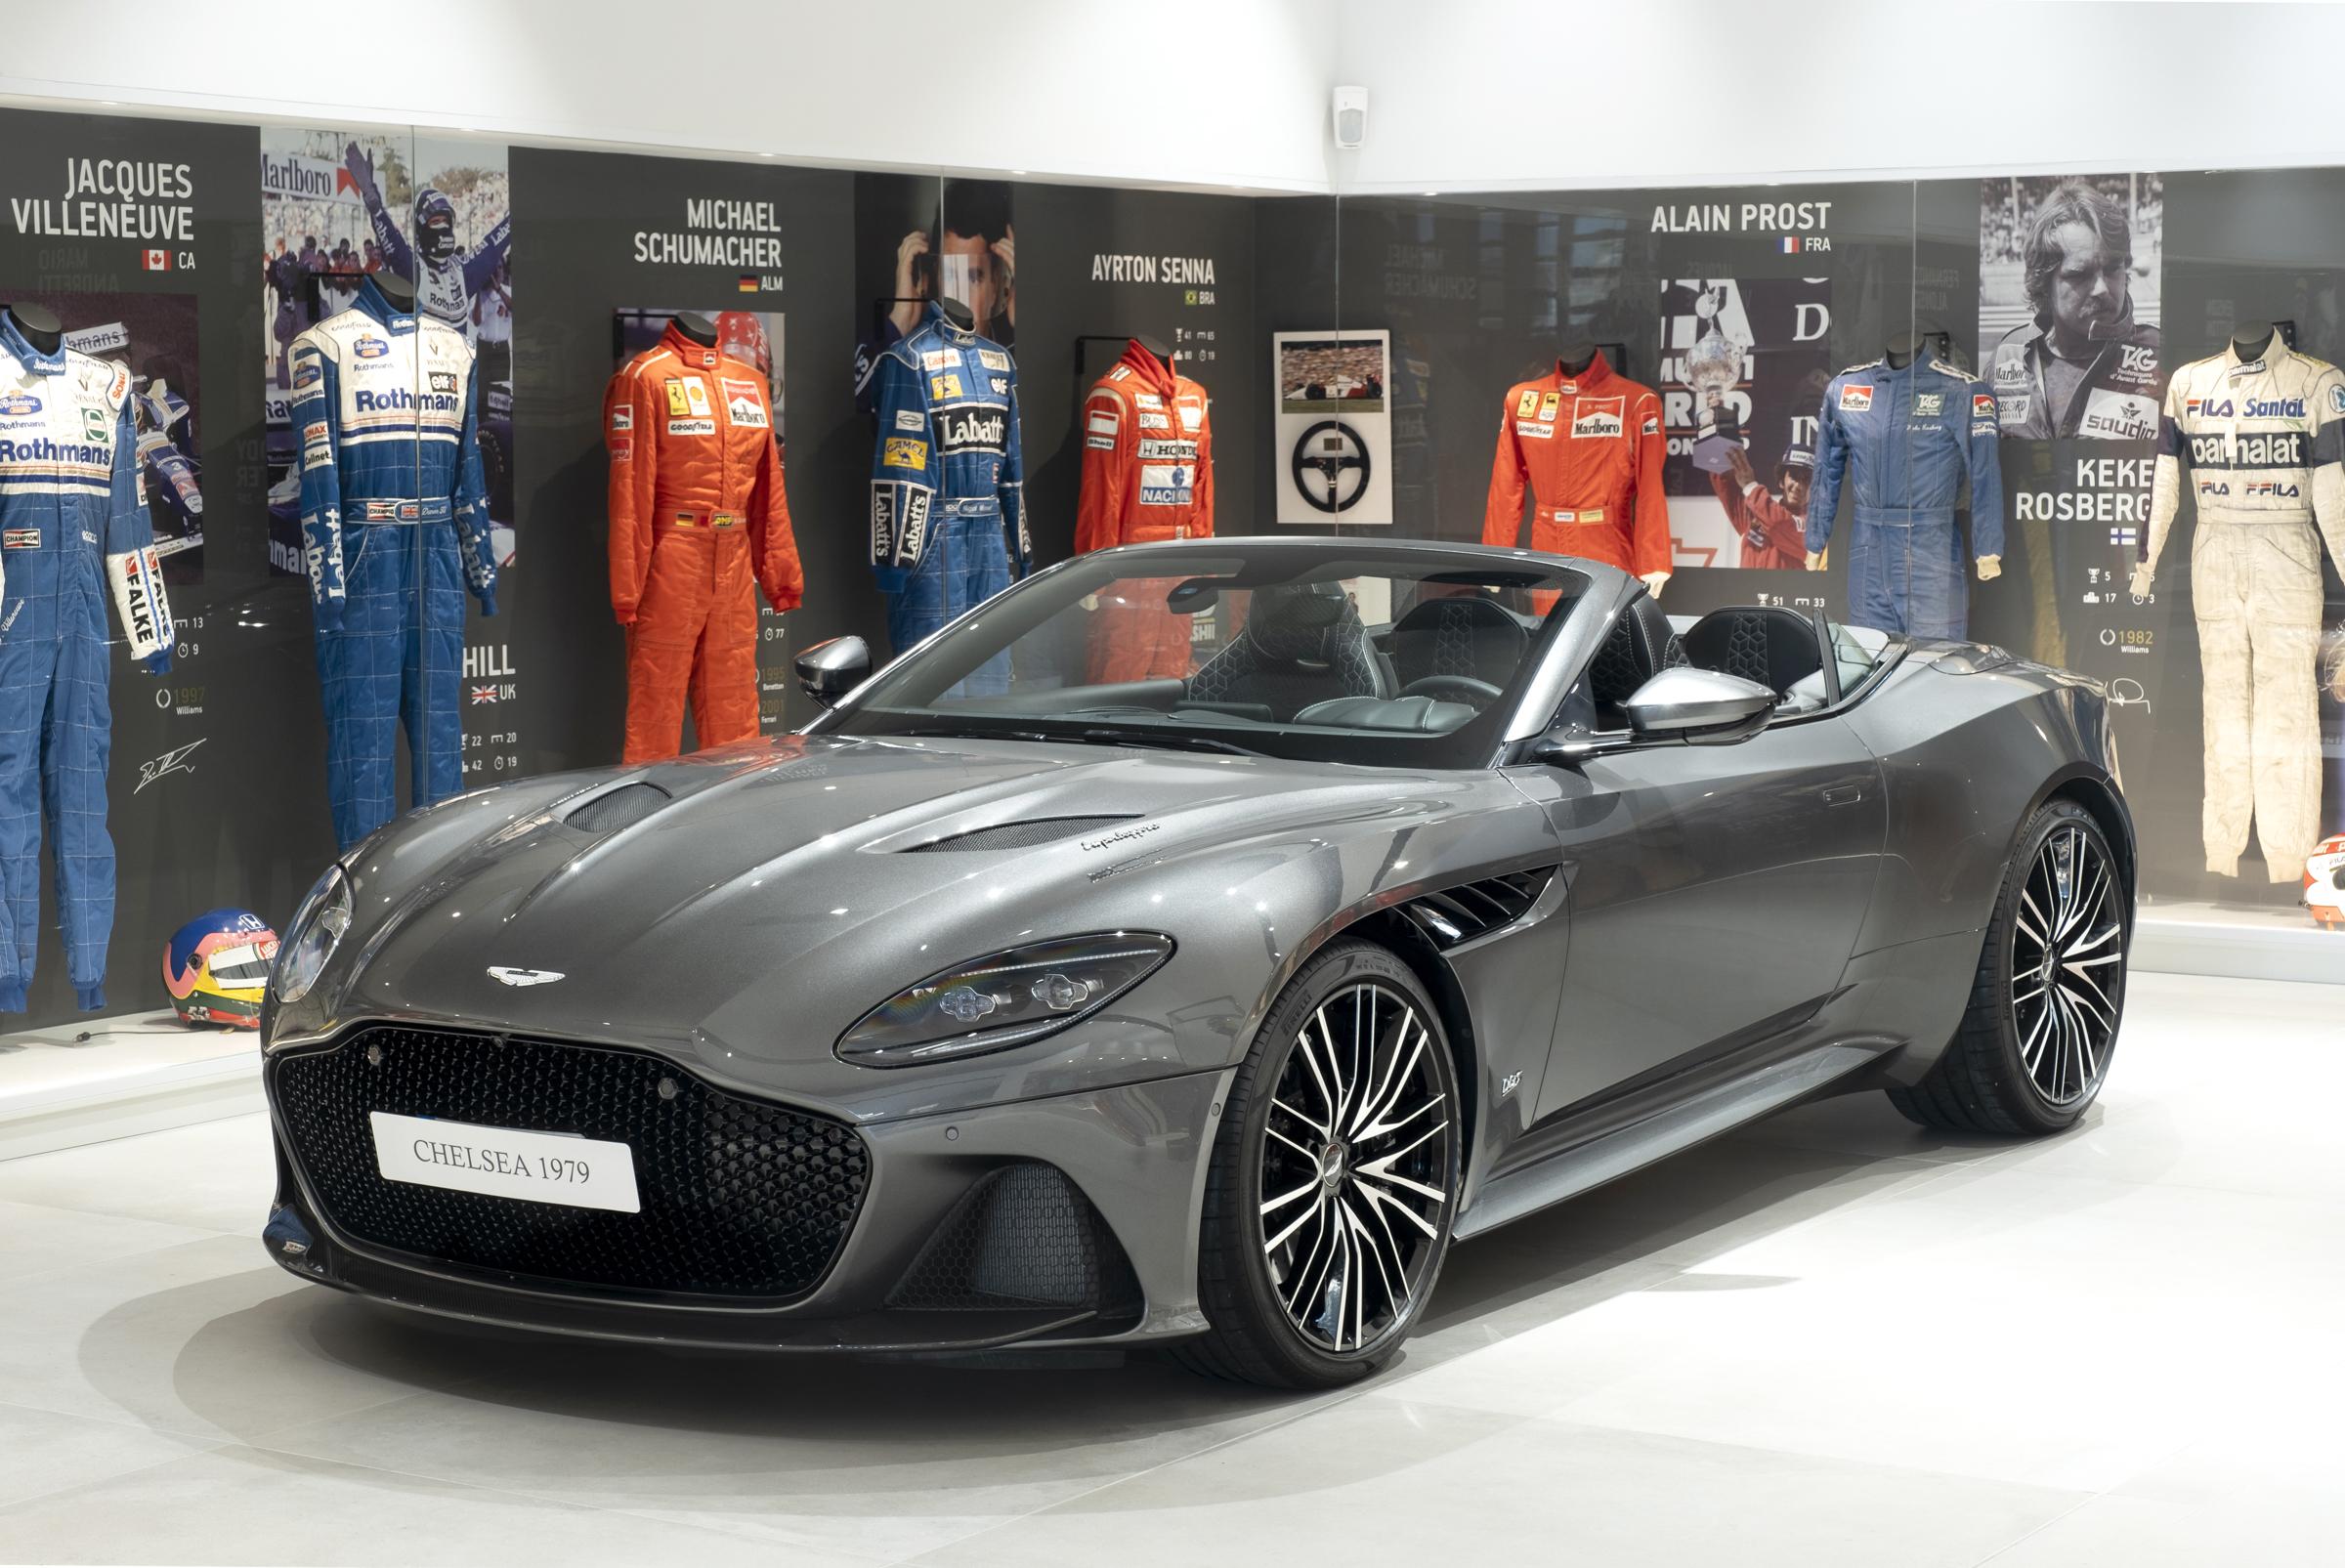 DSCF984301 Aston Martin DBS Superleggera